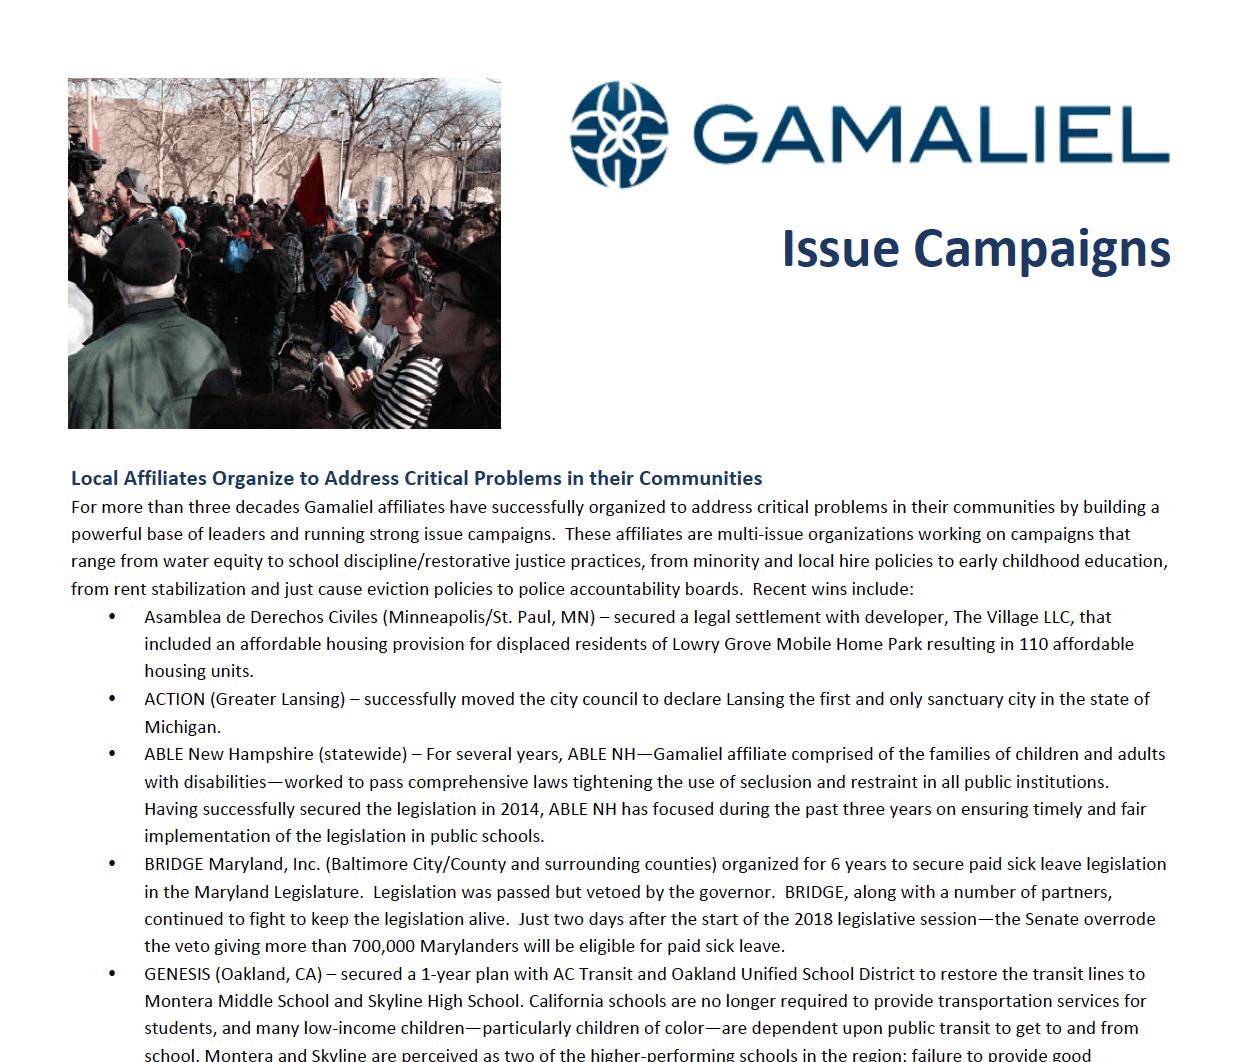 Gamaliel Issue Campaigns